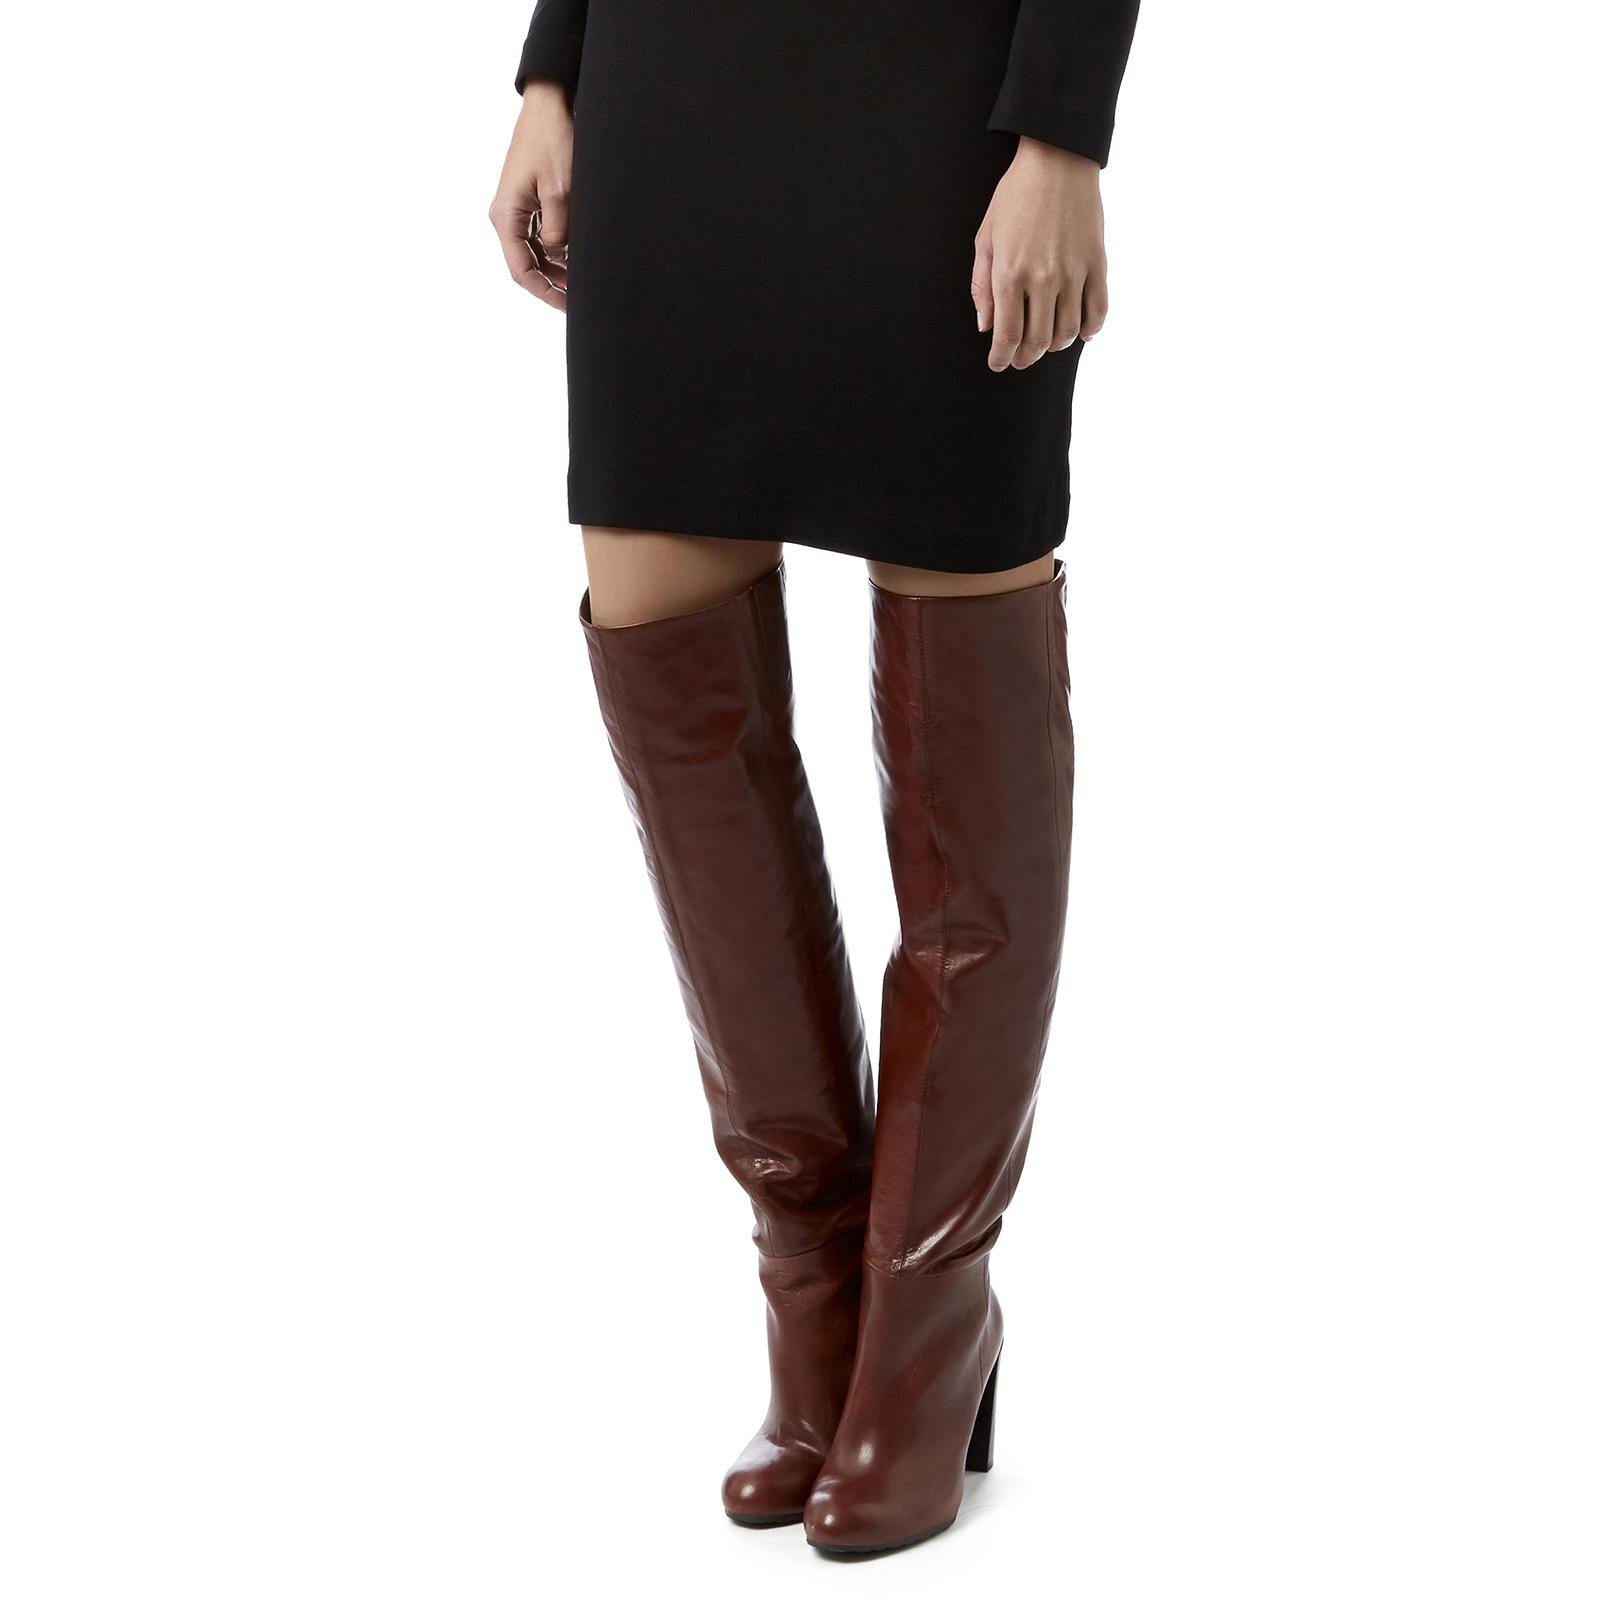 e15bc247cea SNOWFALL Nine West Snowfall Brown Leather High heel High Leg Boots ...